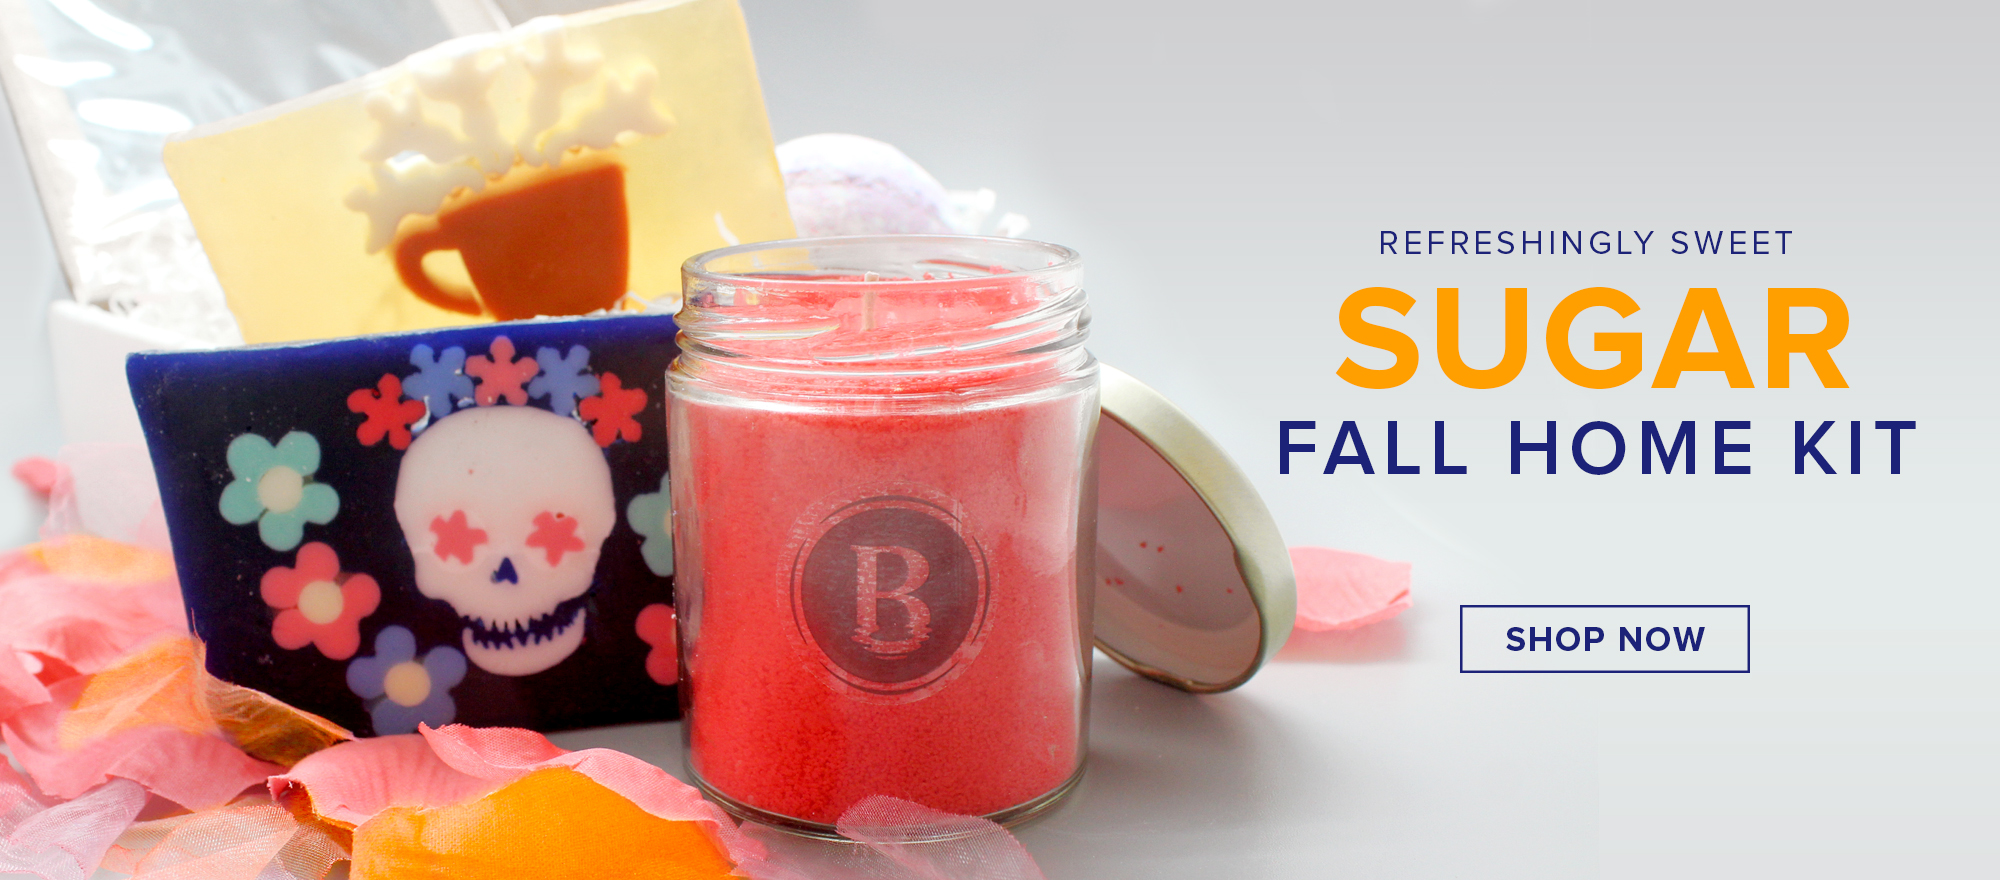 Sugar Fall Home Kit